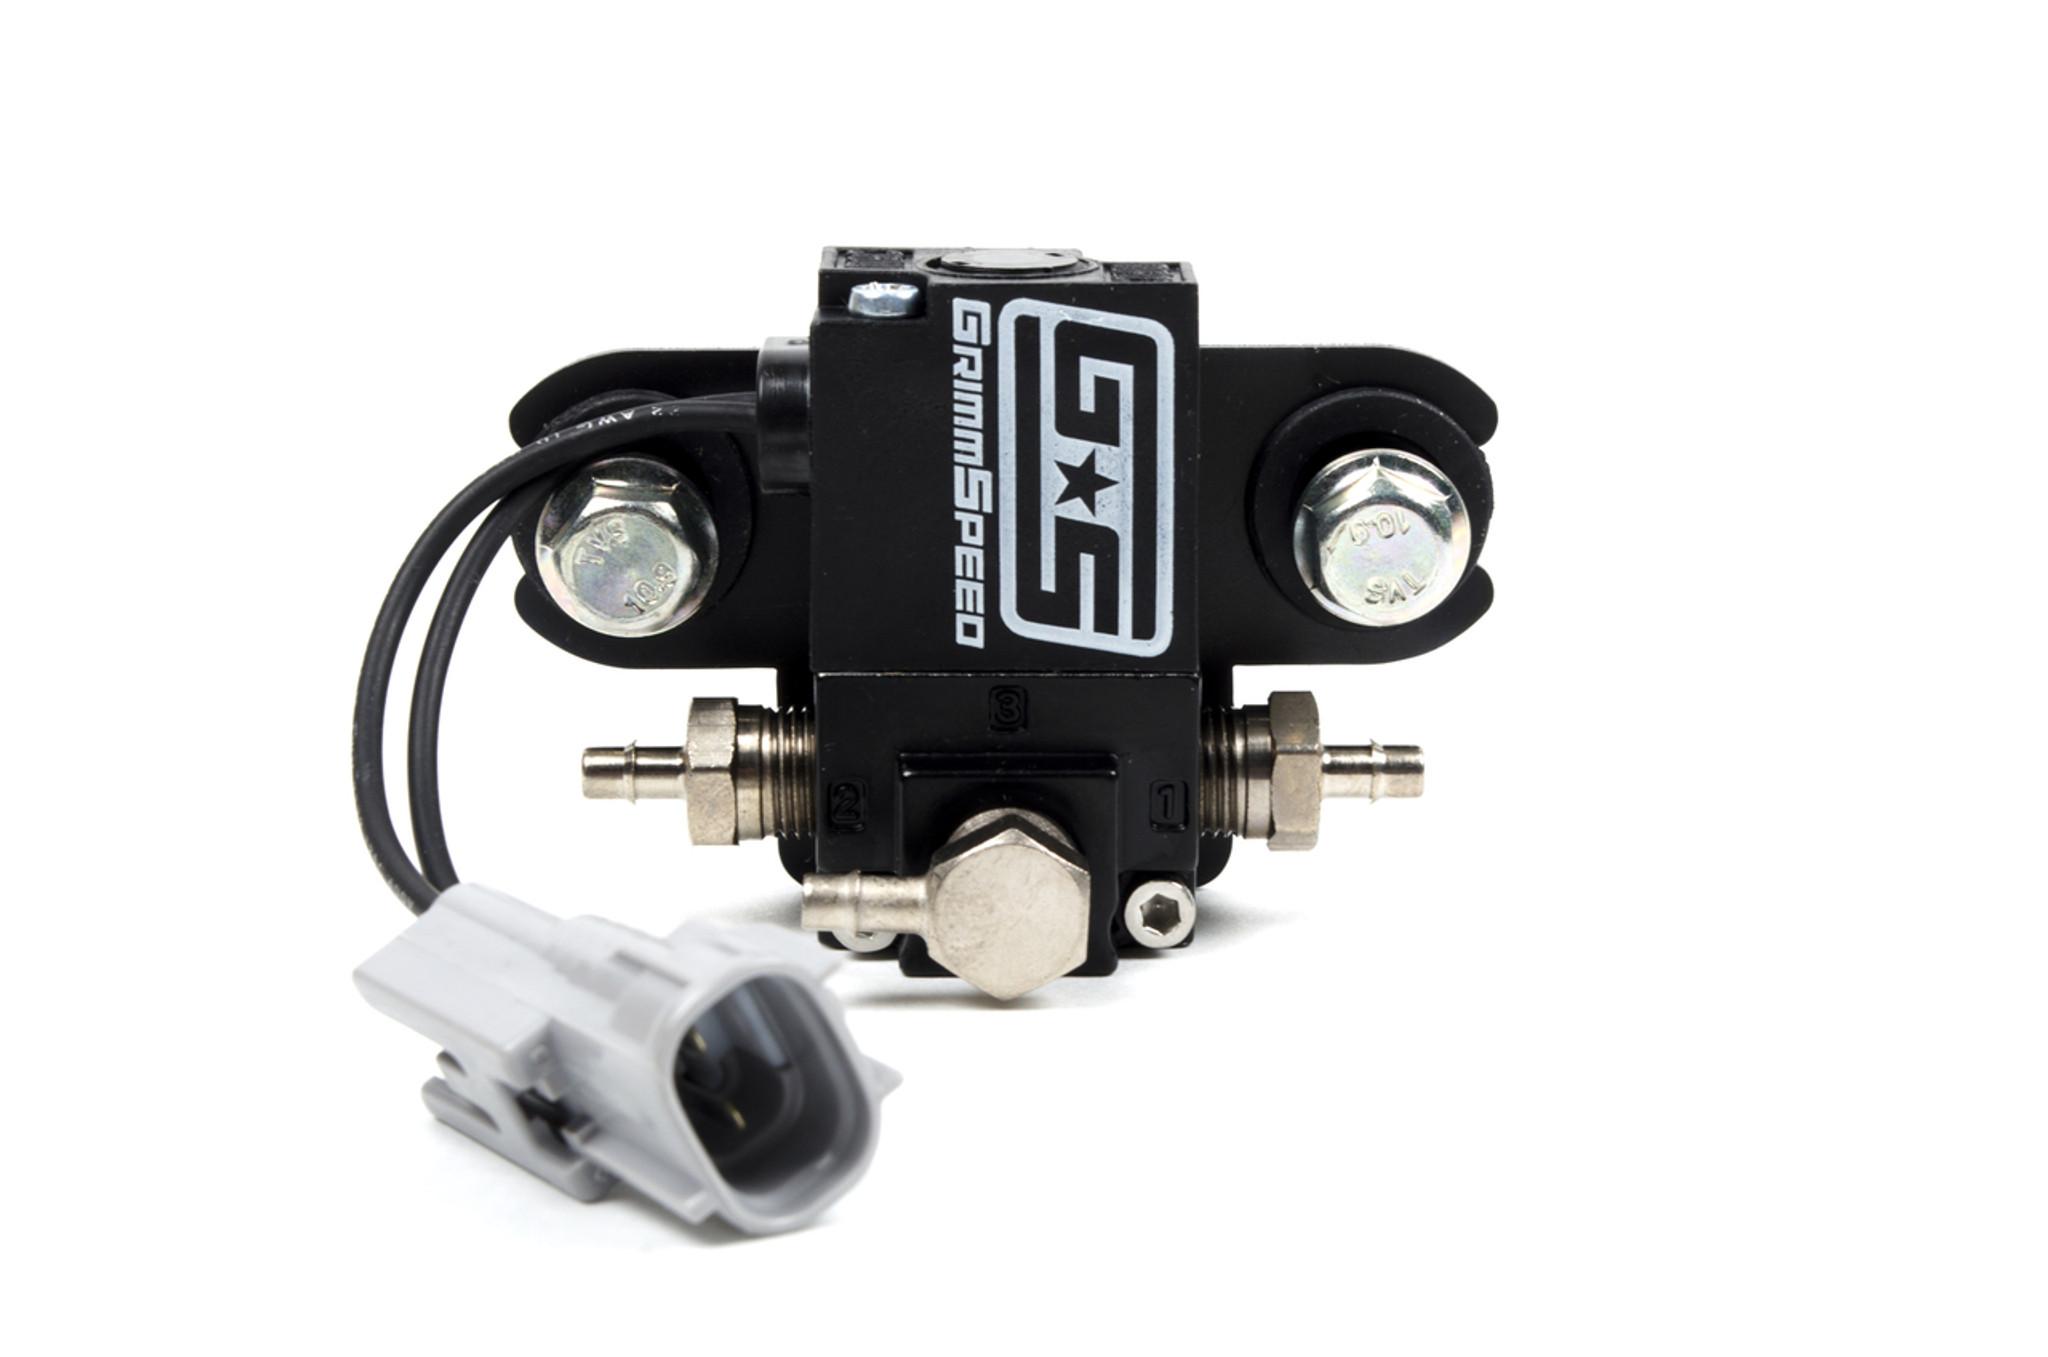 electronic boost control solenoid 3 port subaru 06 07 wrx  [ 1280 x 848 Pixel ]